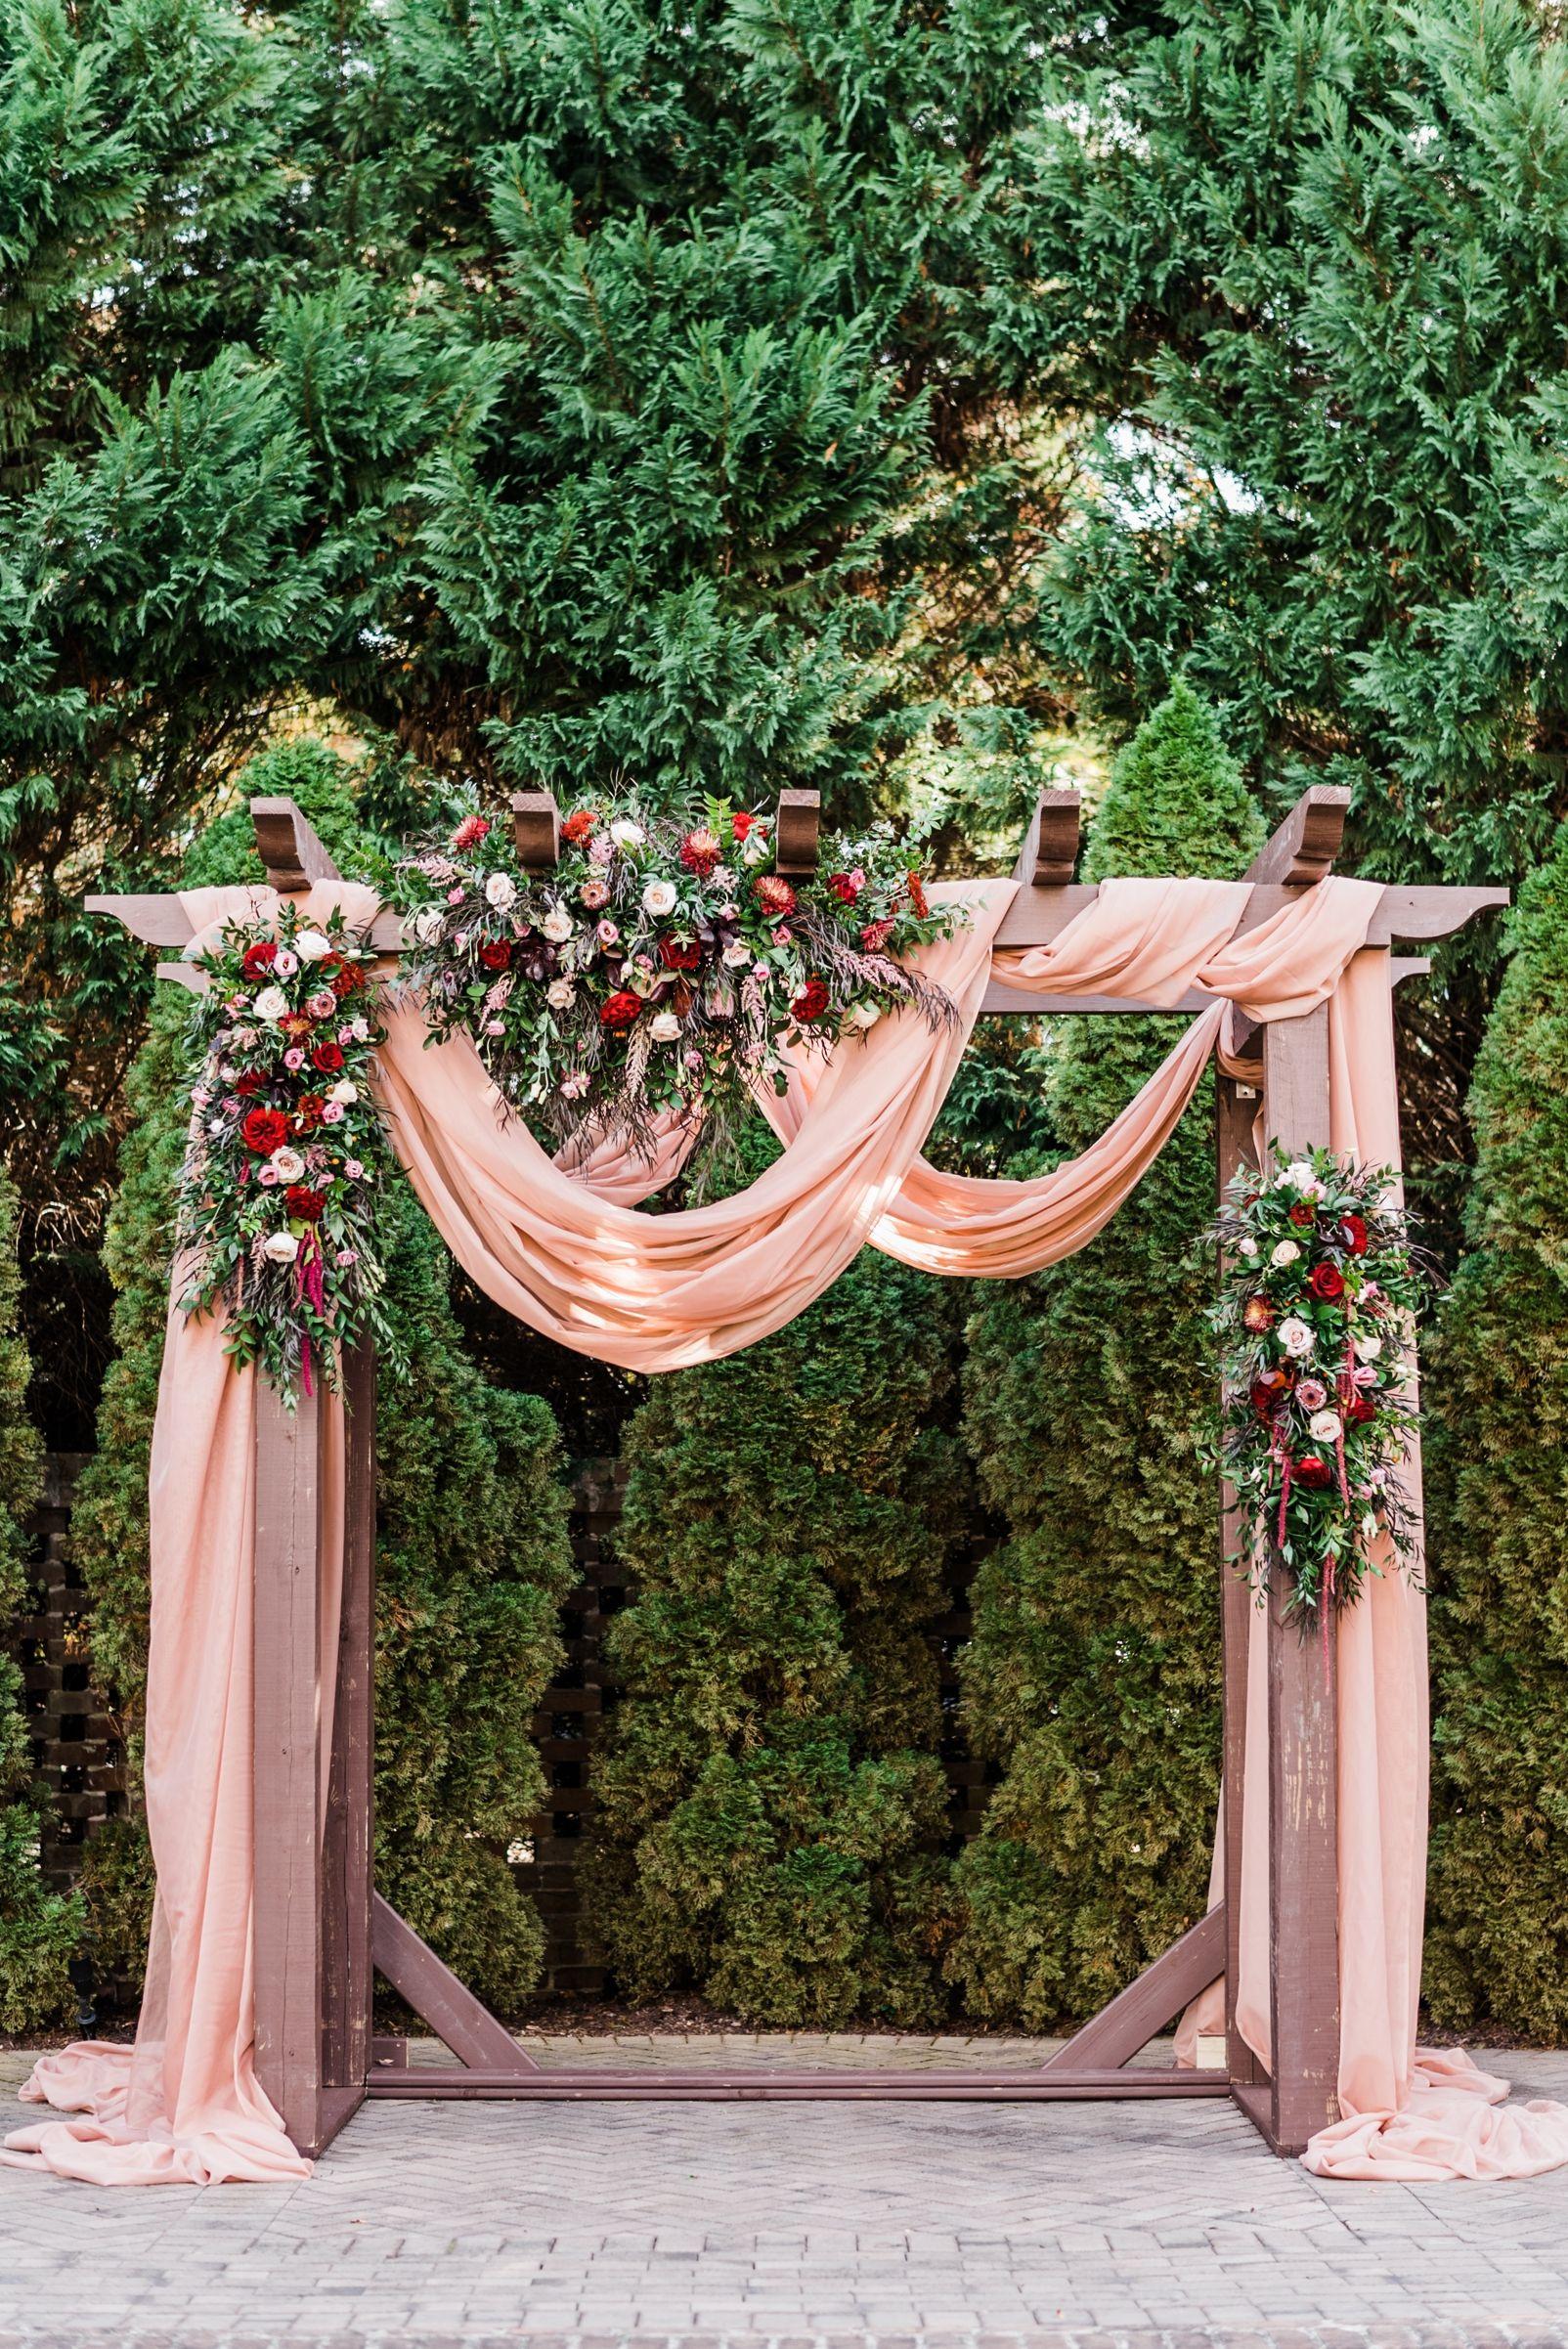 Sutherland Wake Forest Wedding Venue Photos • Estate Weddings